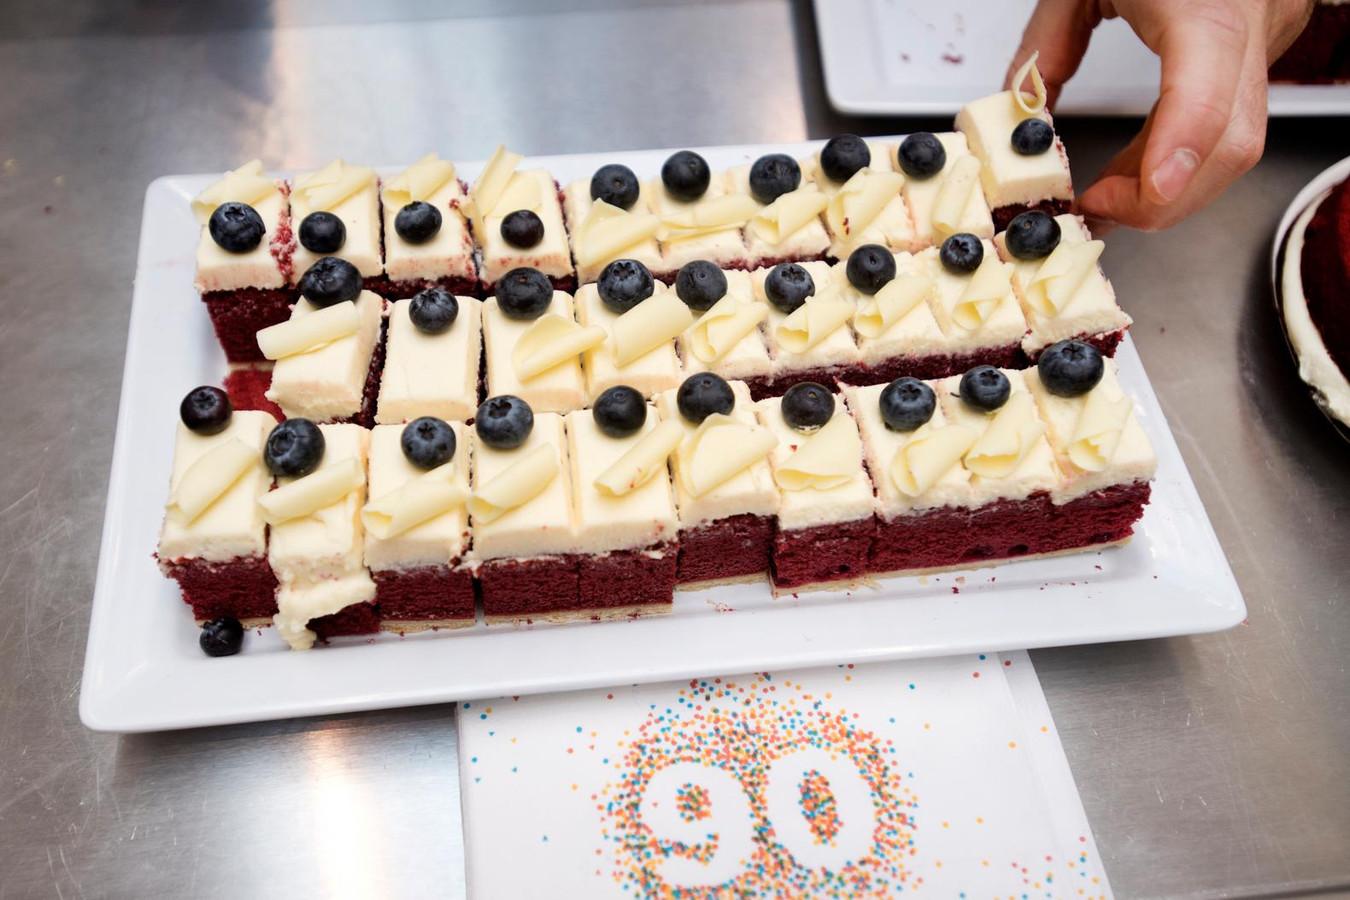 HEMA viert verjaardag met gratis taart   Foto   AD.nl